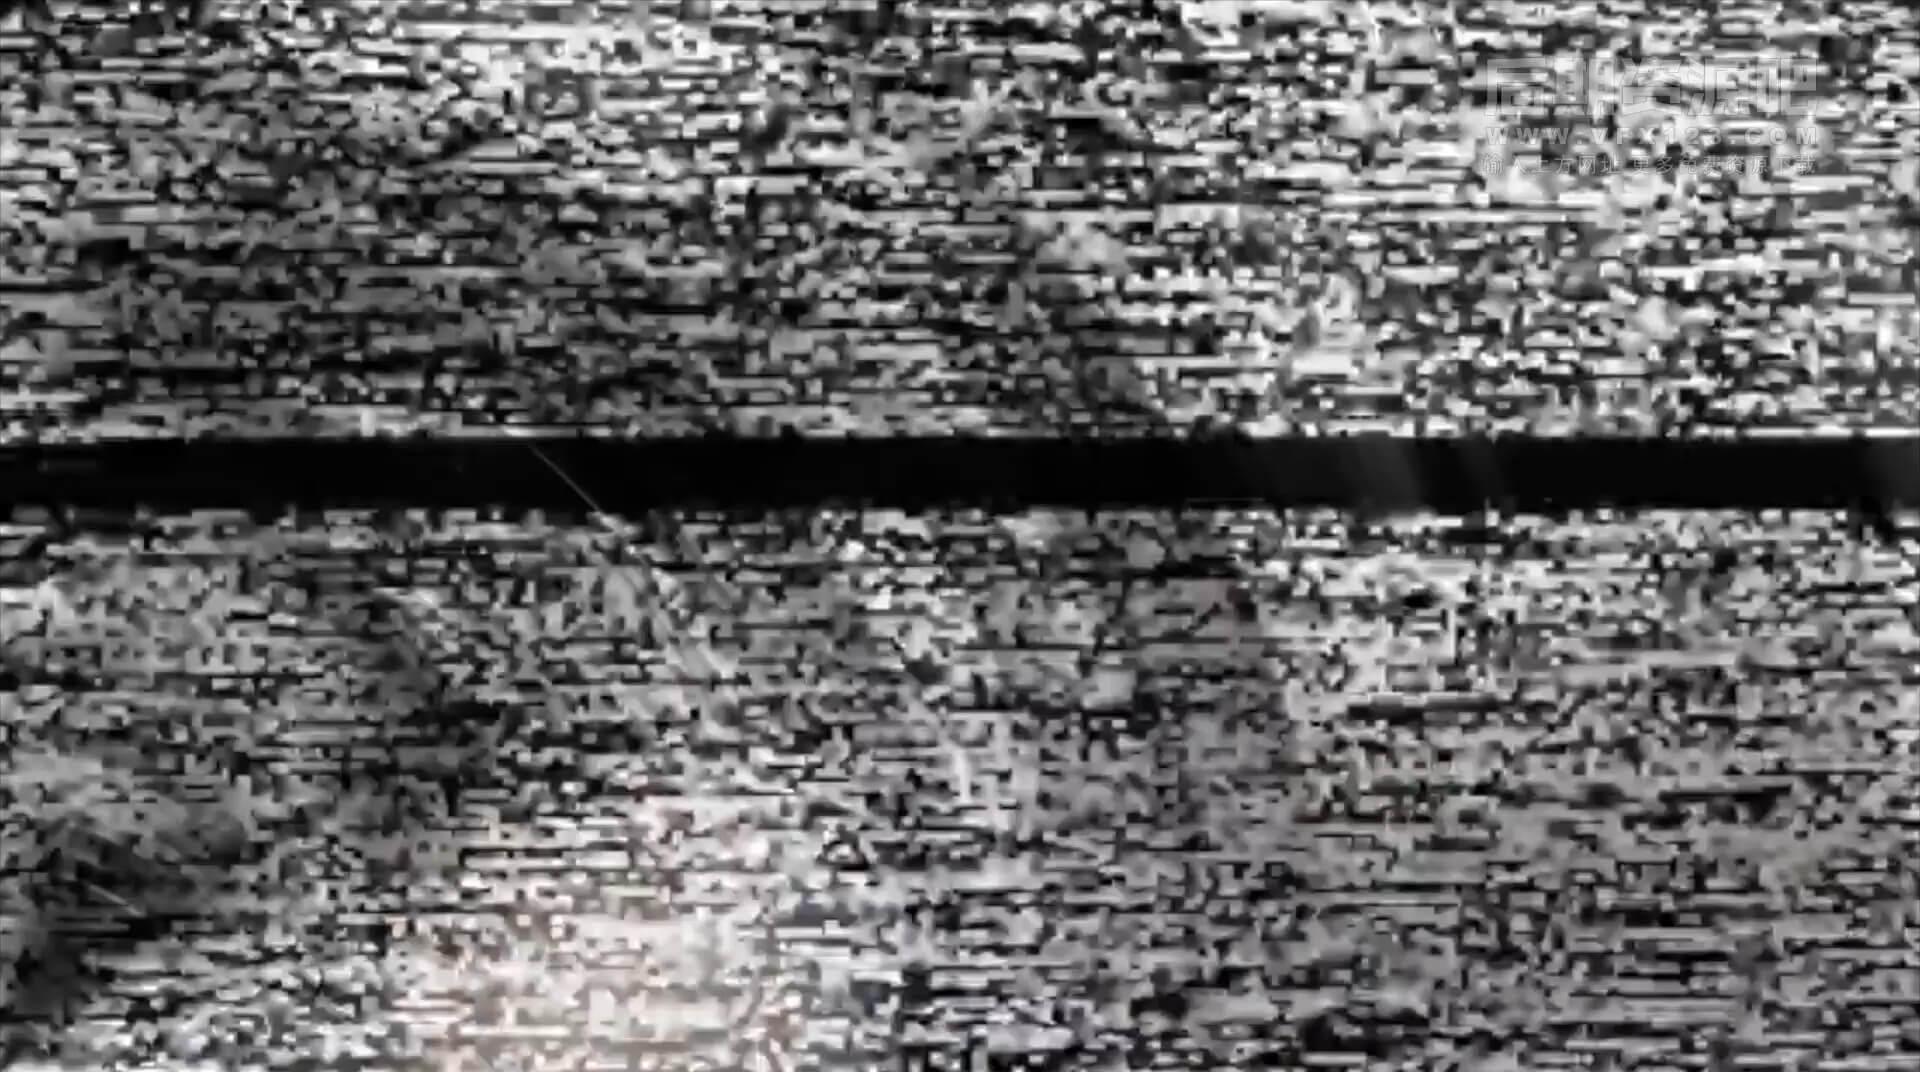 fcpx转场插件 8款复古旧电影干扰特效VHS风格过渡转场 Retro Transitions